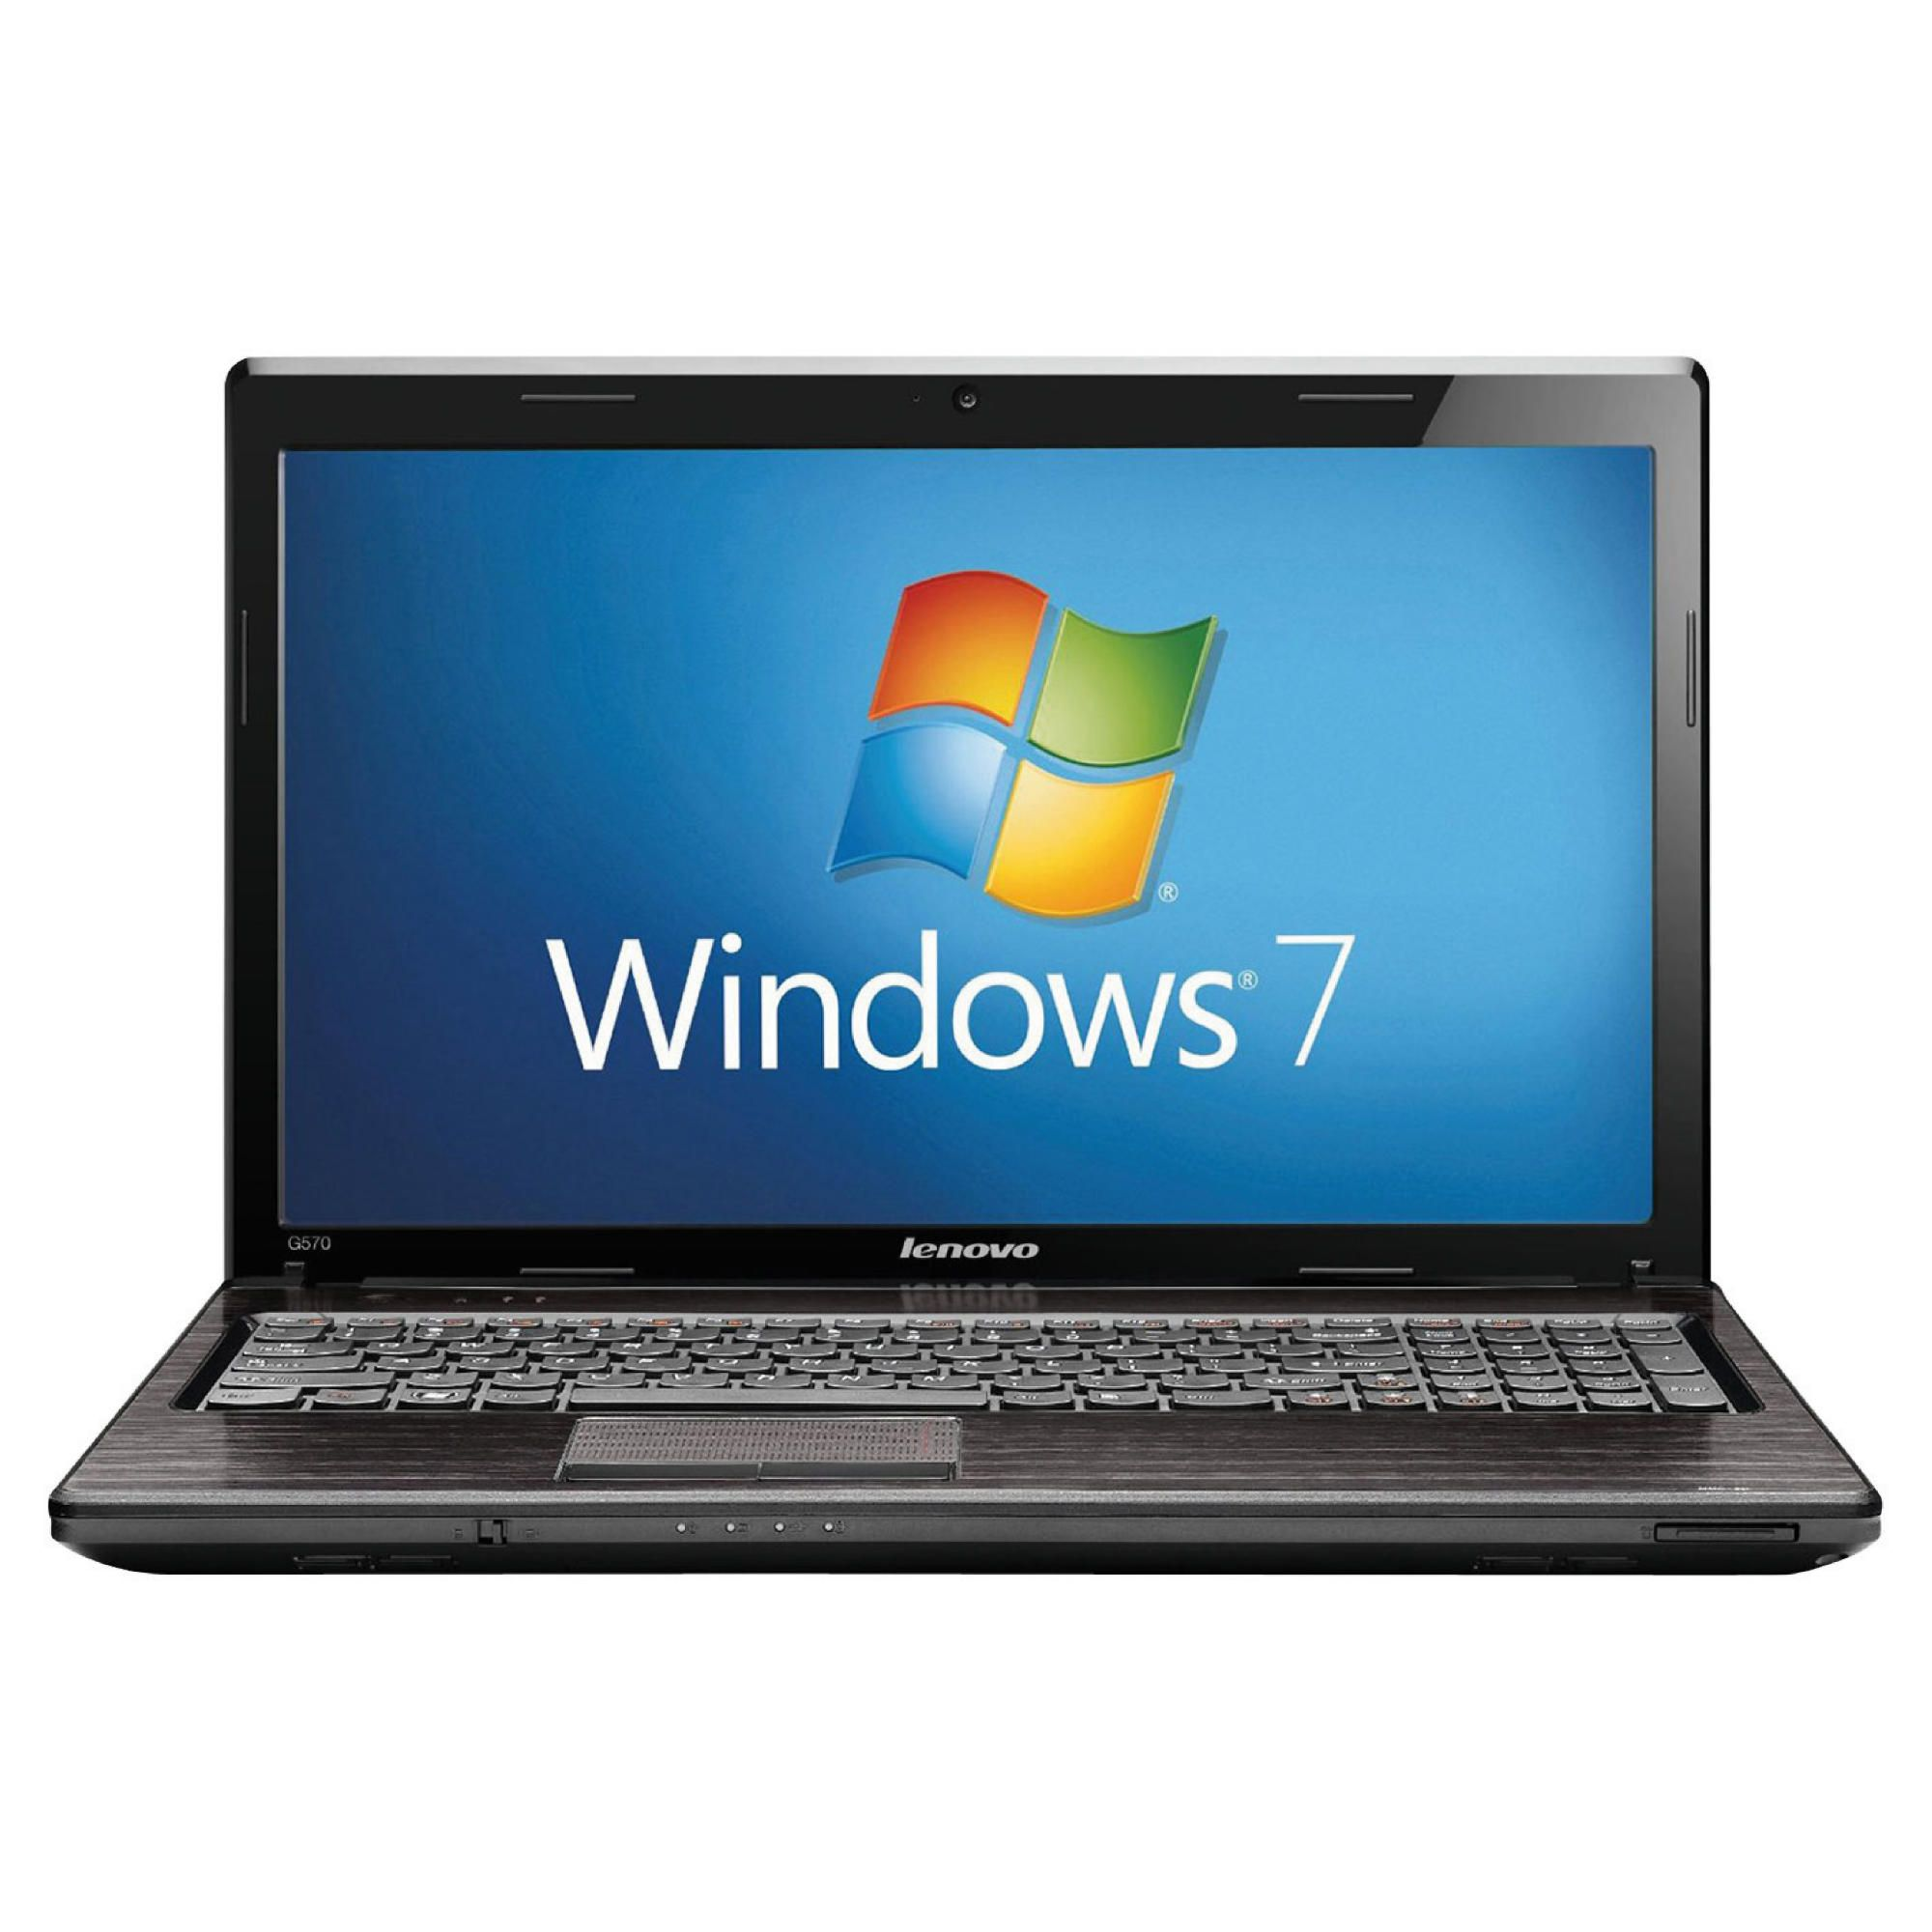 Lenovo G570 Laptop (Intel Core i3, 4GB, 500GB, 15.6'' Display) Black at Tesco Direct